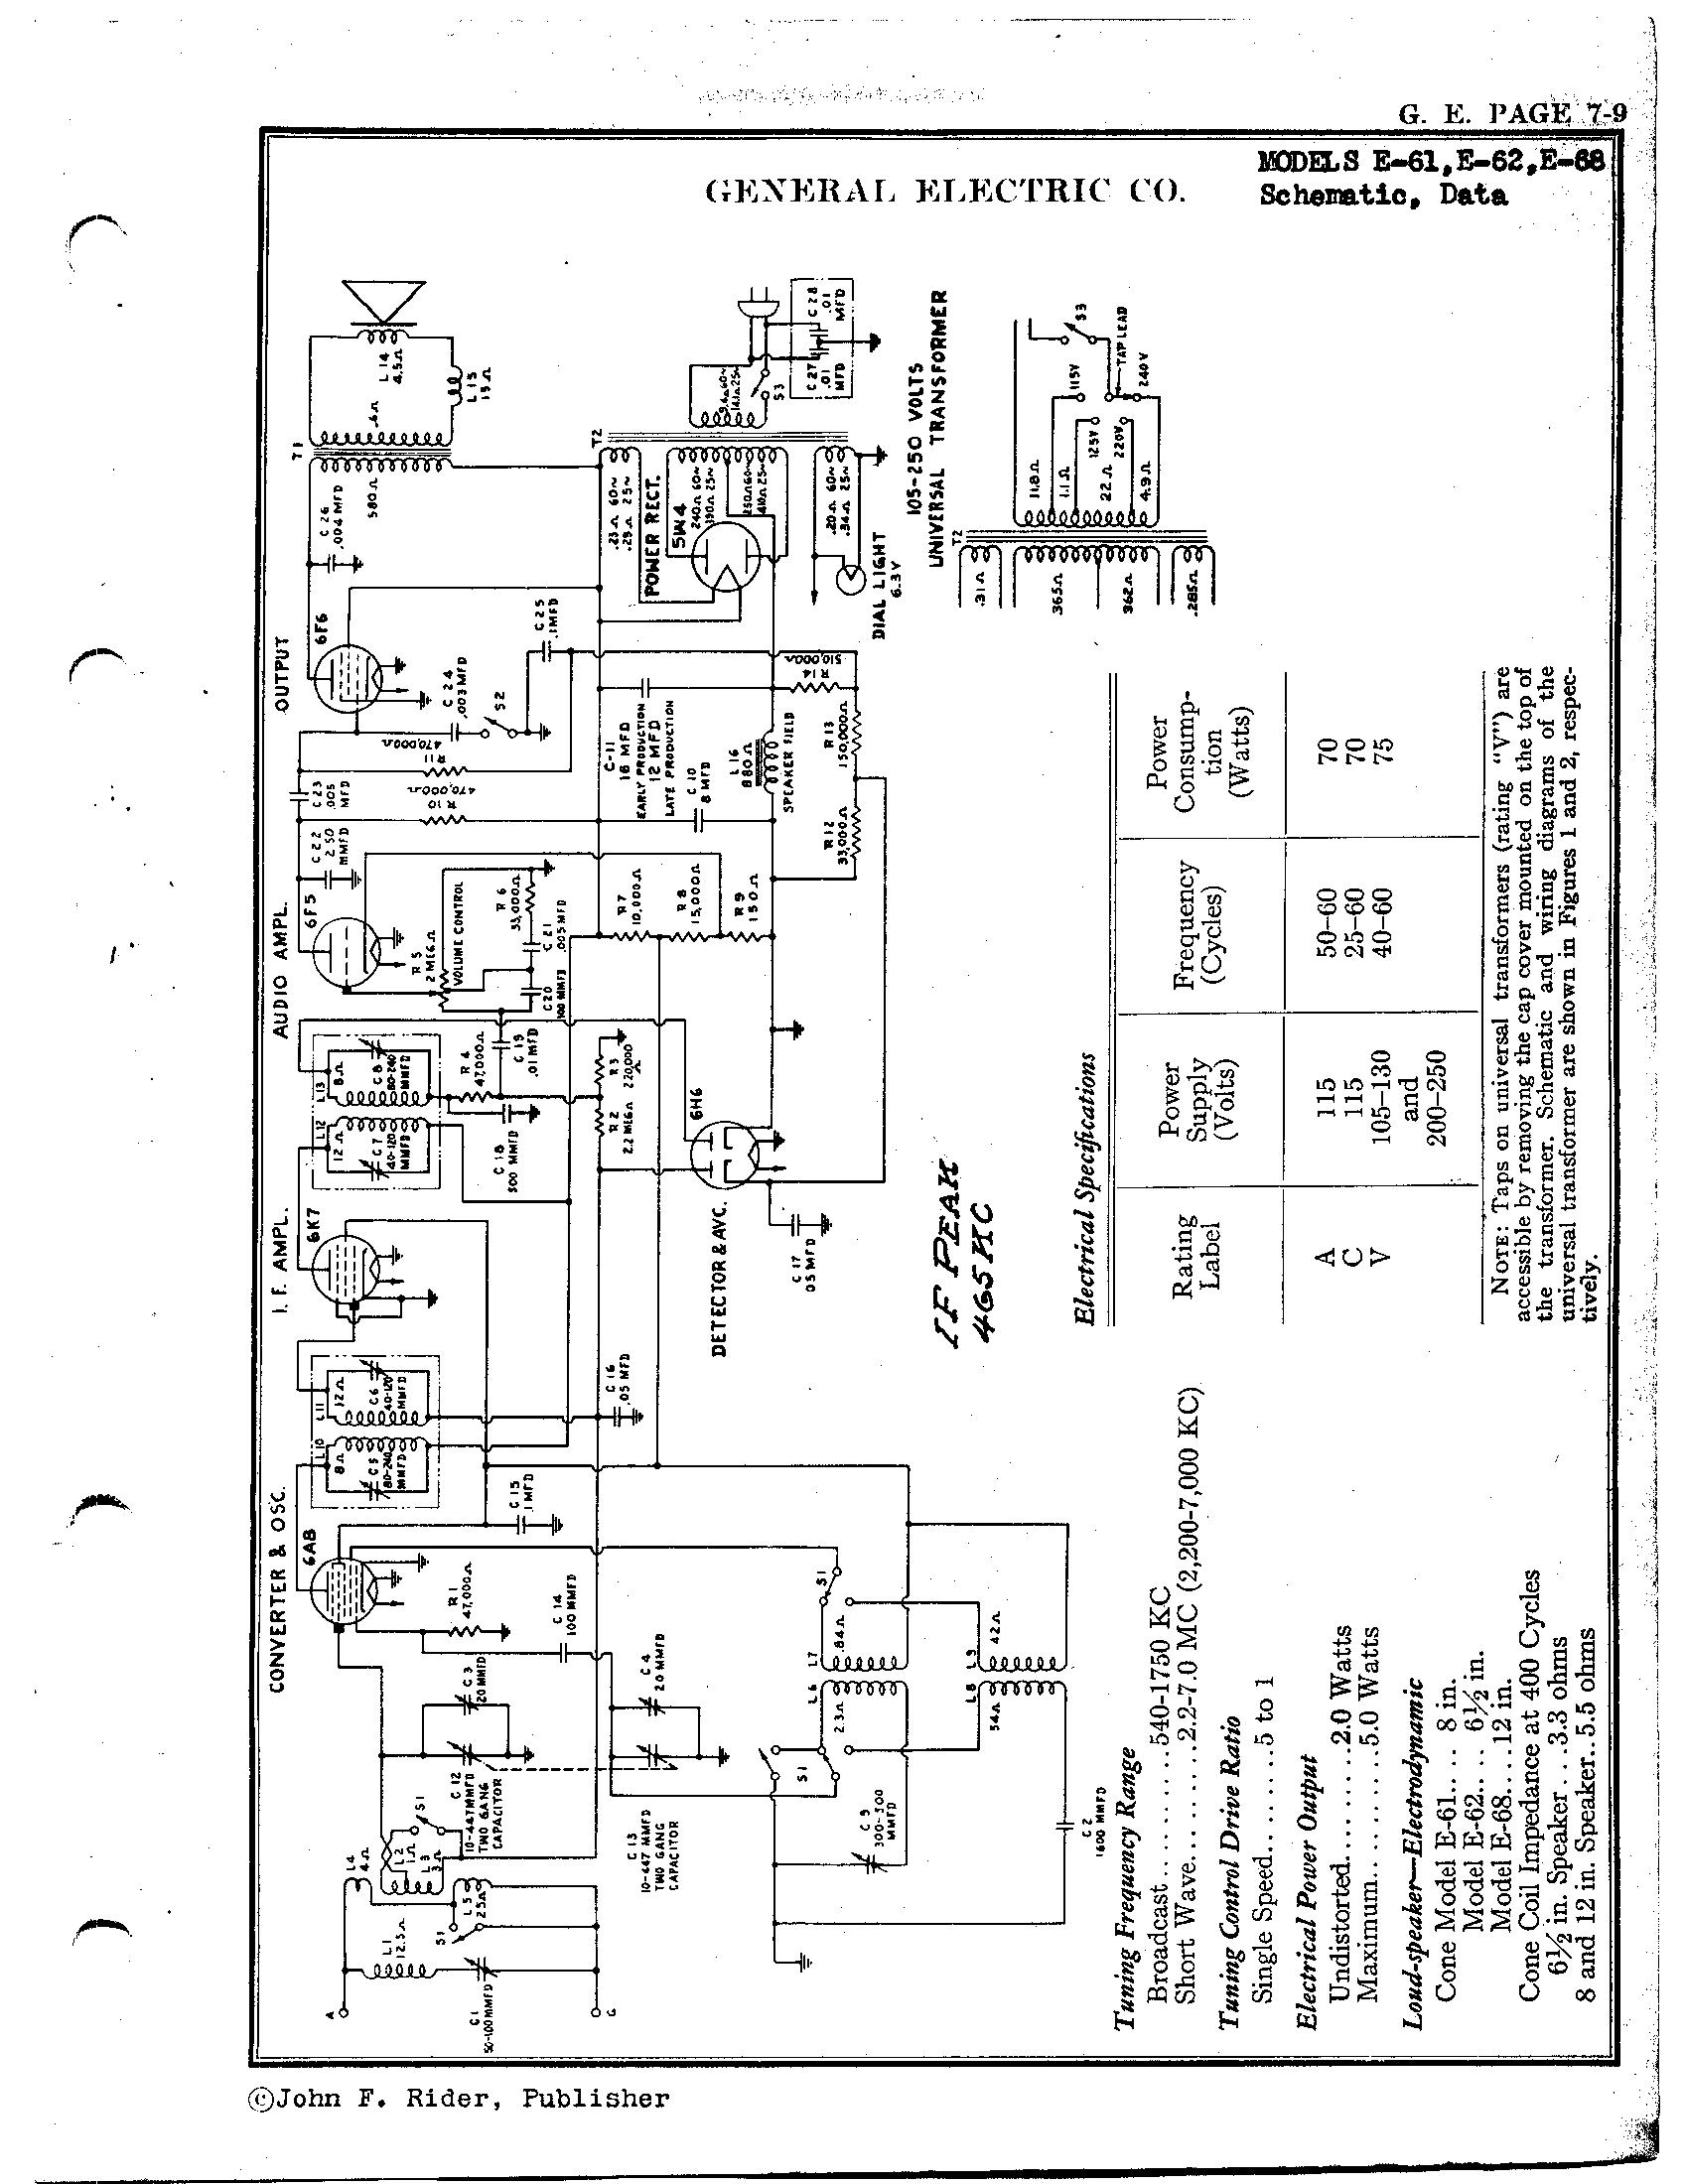 General Electric Co E62